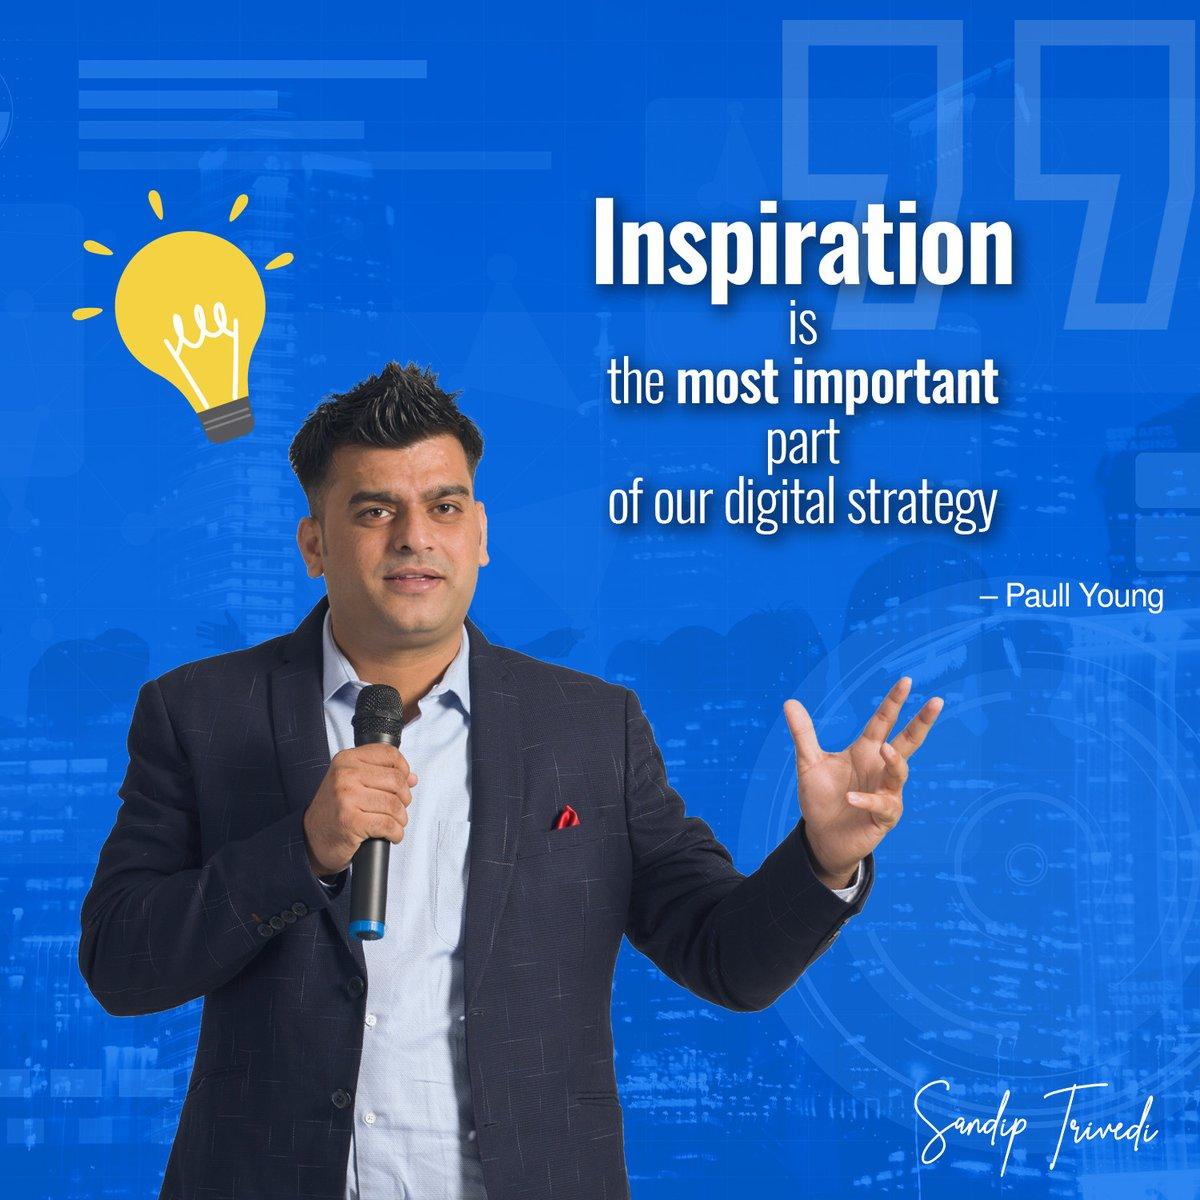 """So lets talk about who Inspires you. . . . #MondayMotivation #digitalmarketing #socialmediamarketing #digitaltraining #sandiptrivedi #trendy #headlines #brand #digitalconsultant #creativity #relavance #searchengineoptimization #entrepreneur #successpic.twitter.com/oQNs8h1YcP"